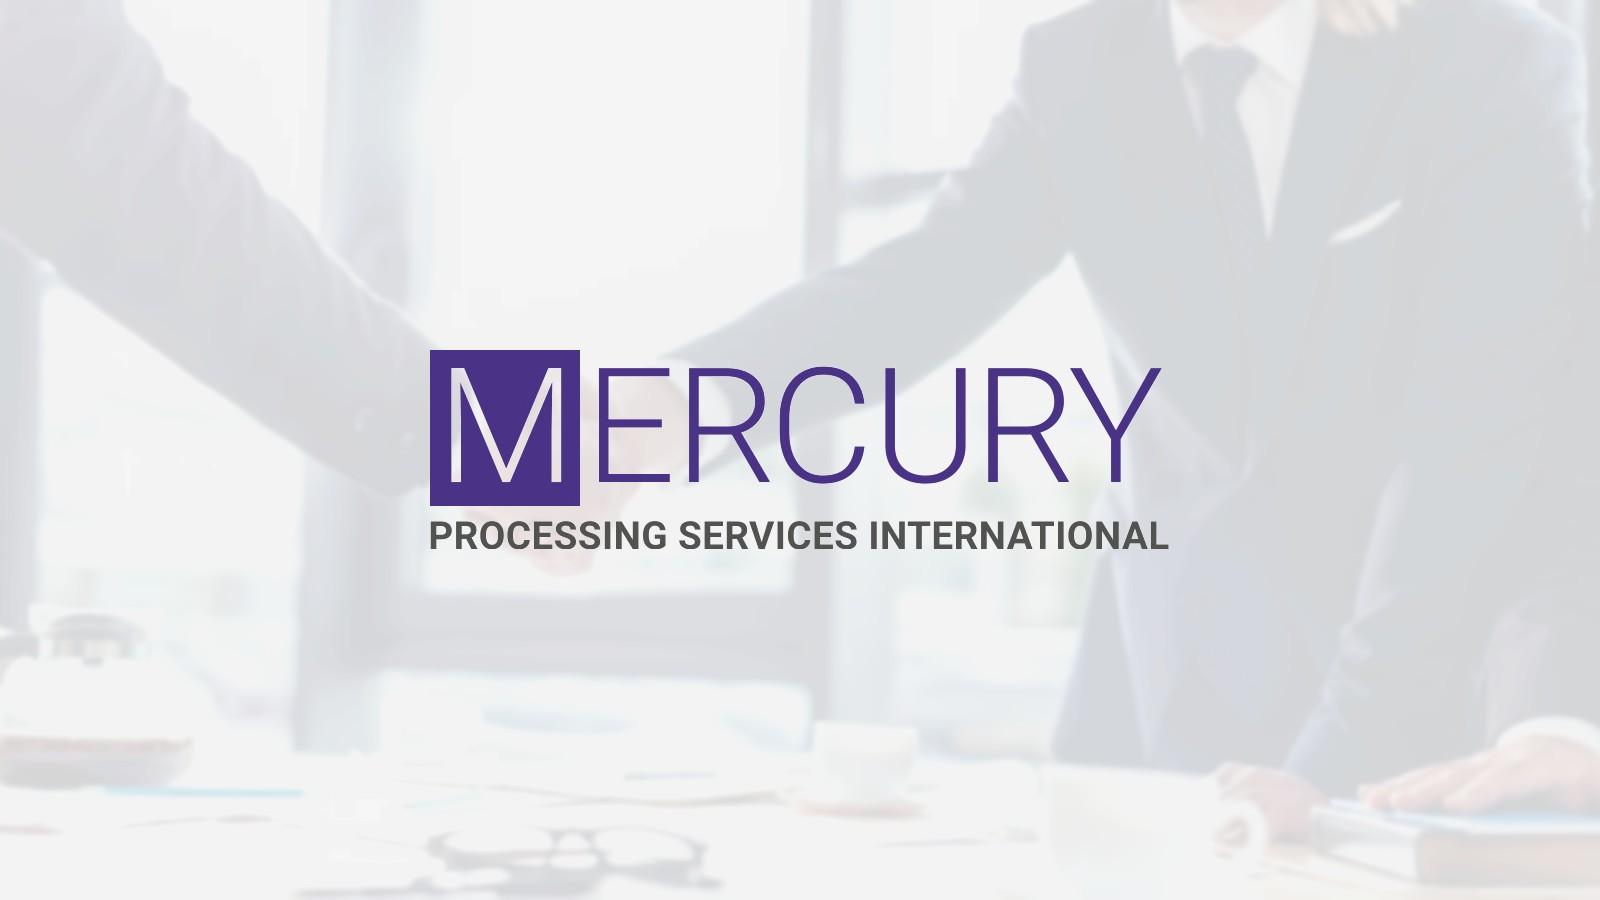 Mercury Processing Services International Chooses comforte AG for Enterprise Data Security